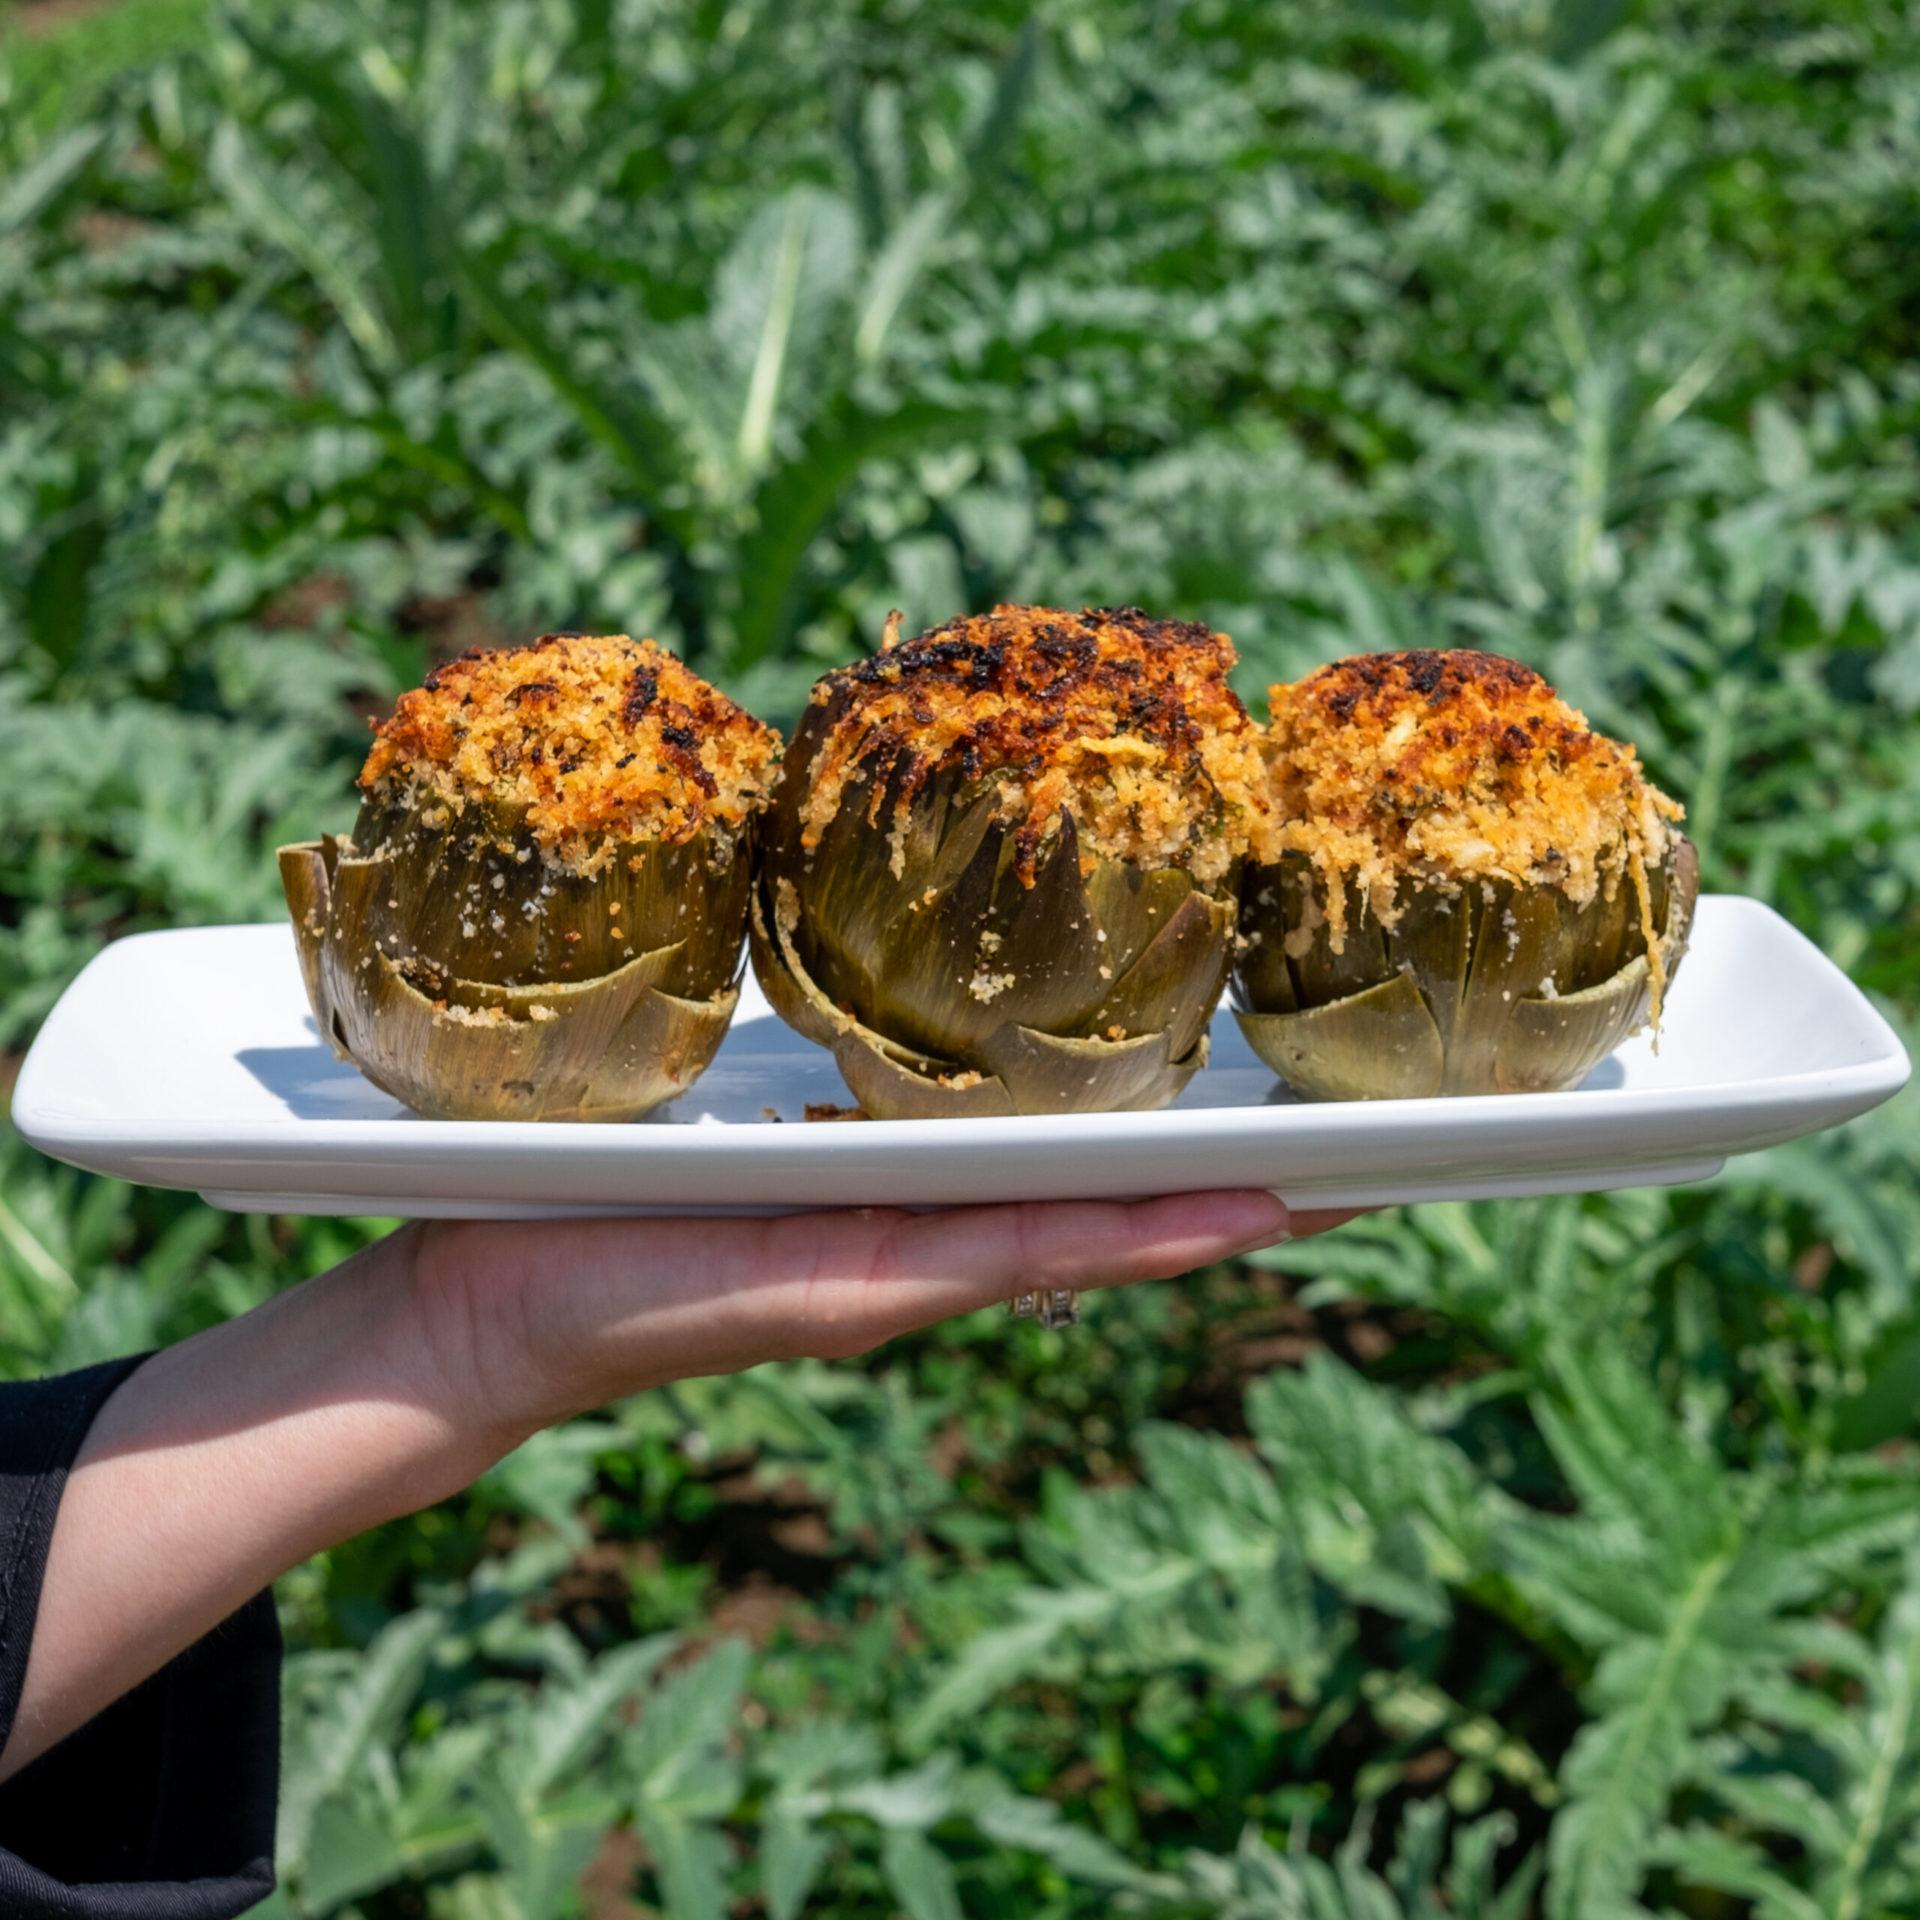 herb and cheese stuffed artichokes